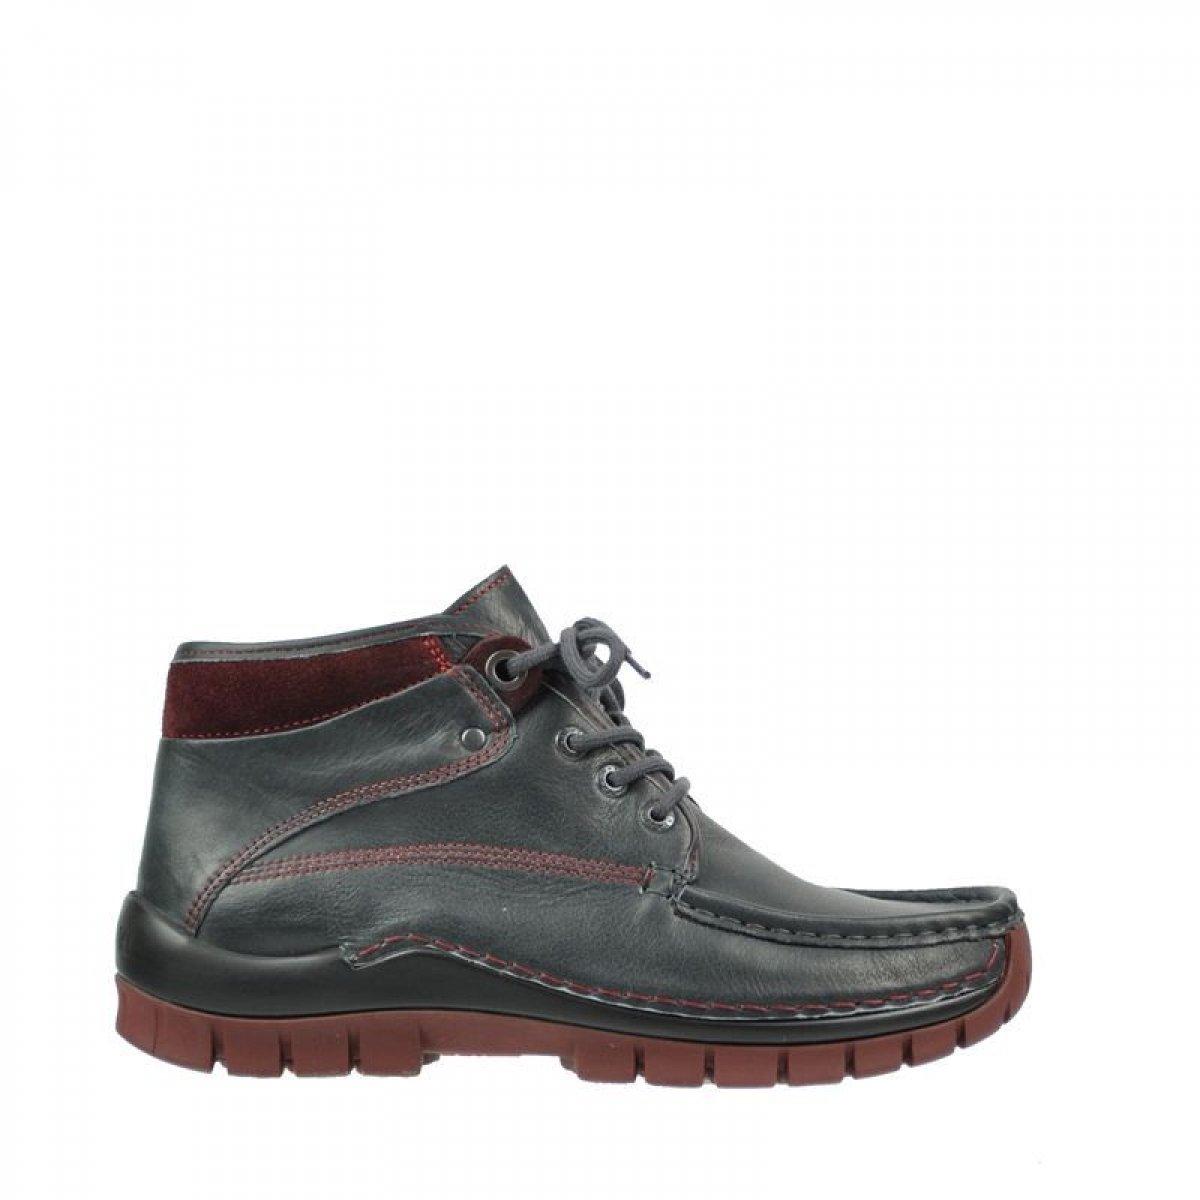 Wolky Comfort Lace up Shoes Cross Winter B0056ZJDCA 43 EU|20240 Anthracite-bordeaux Leather